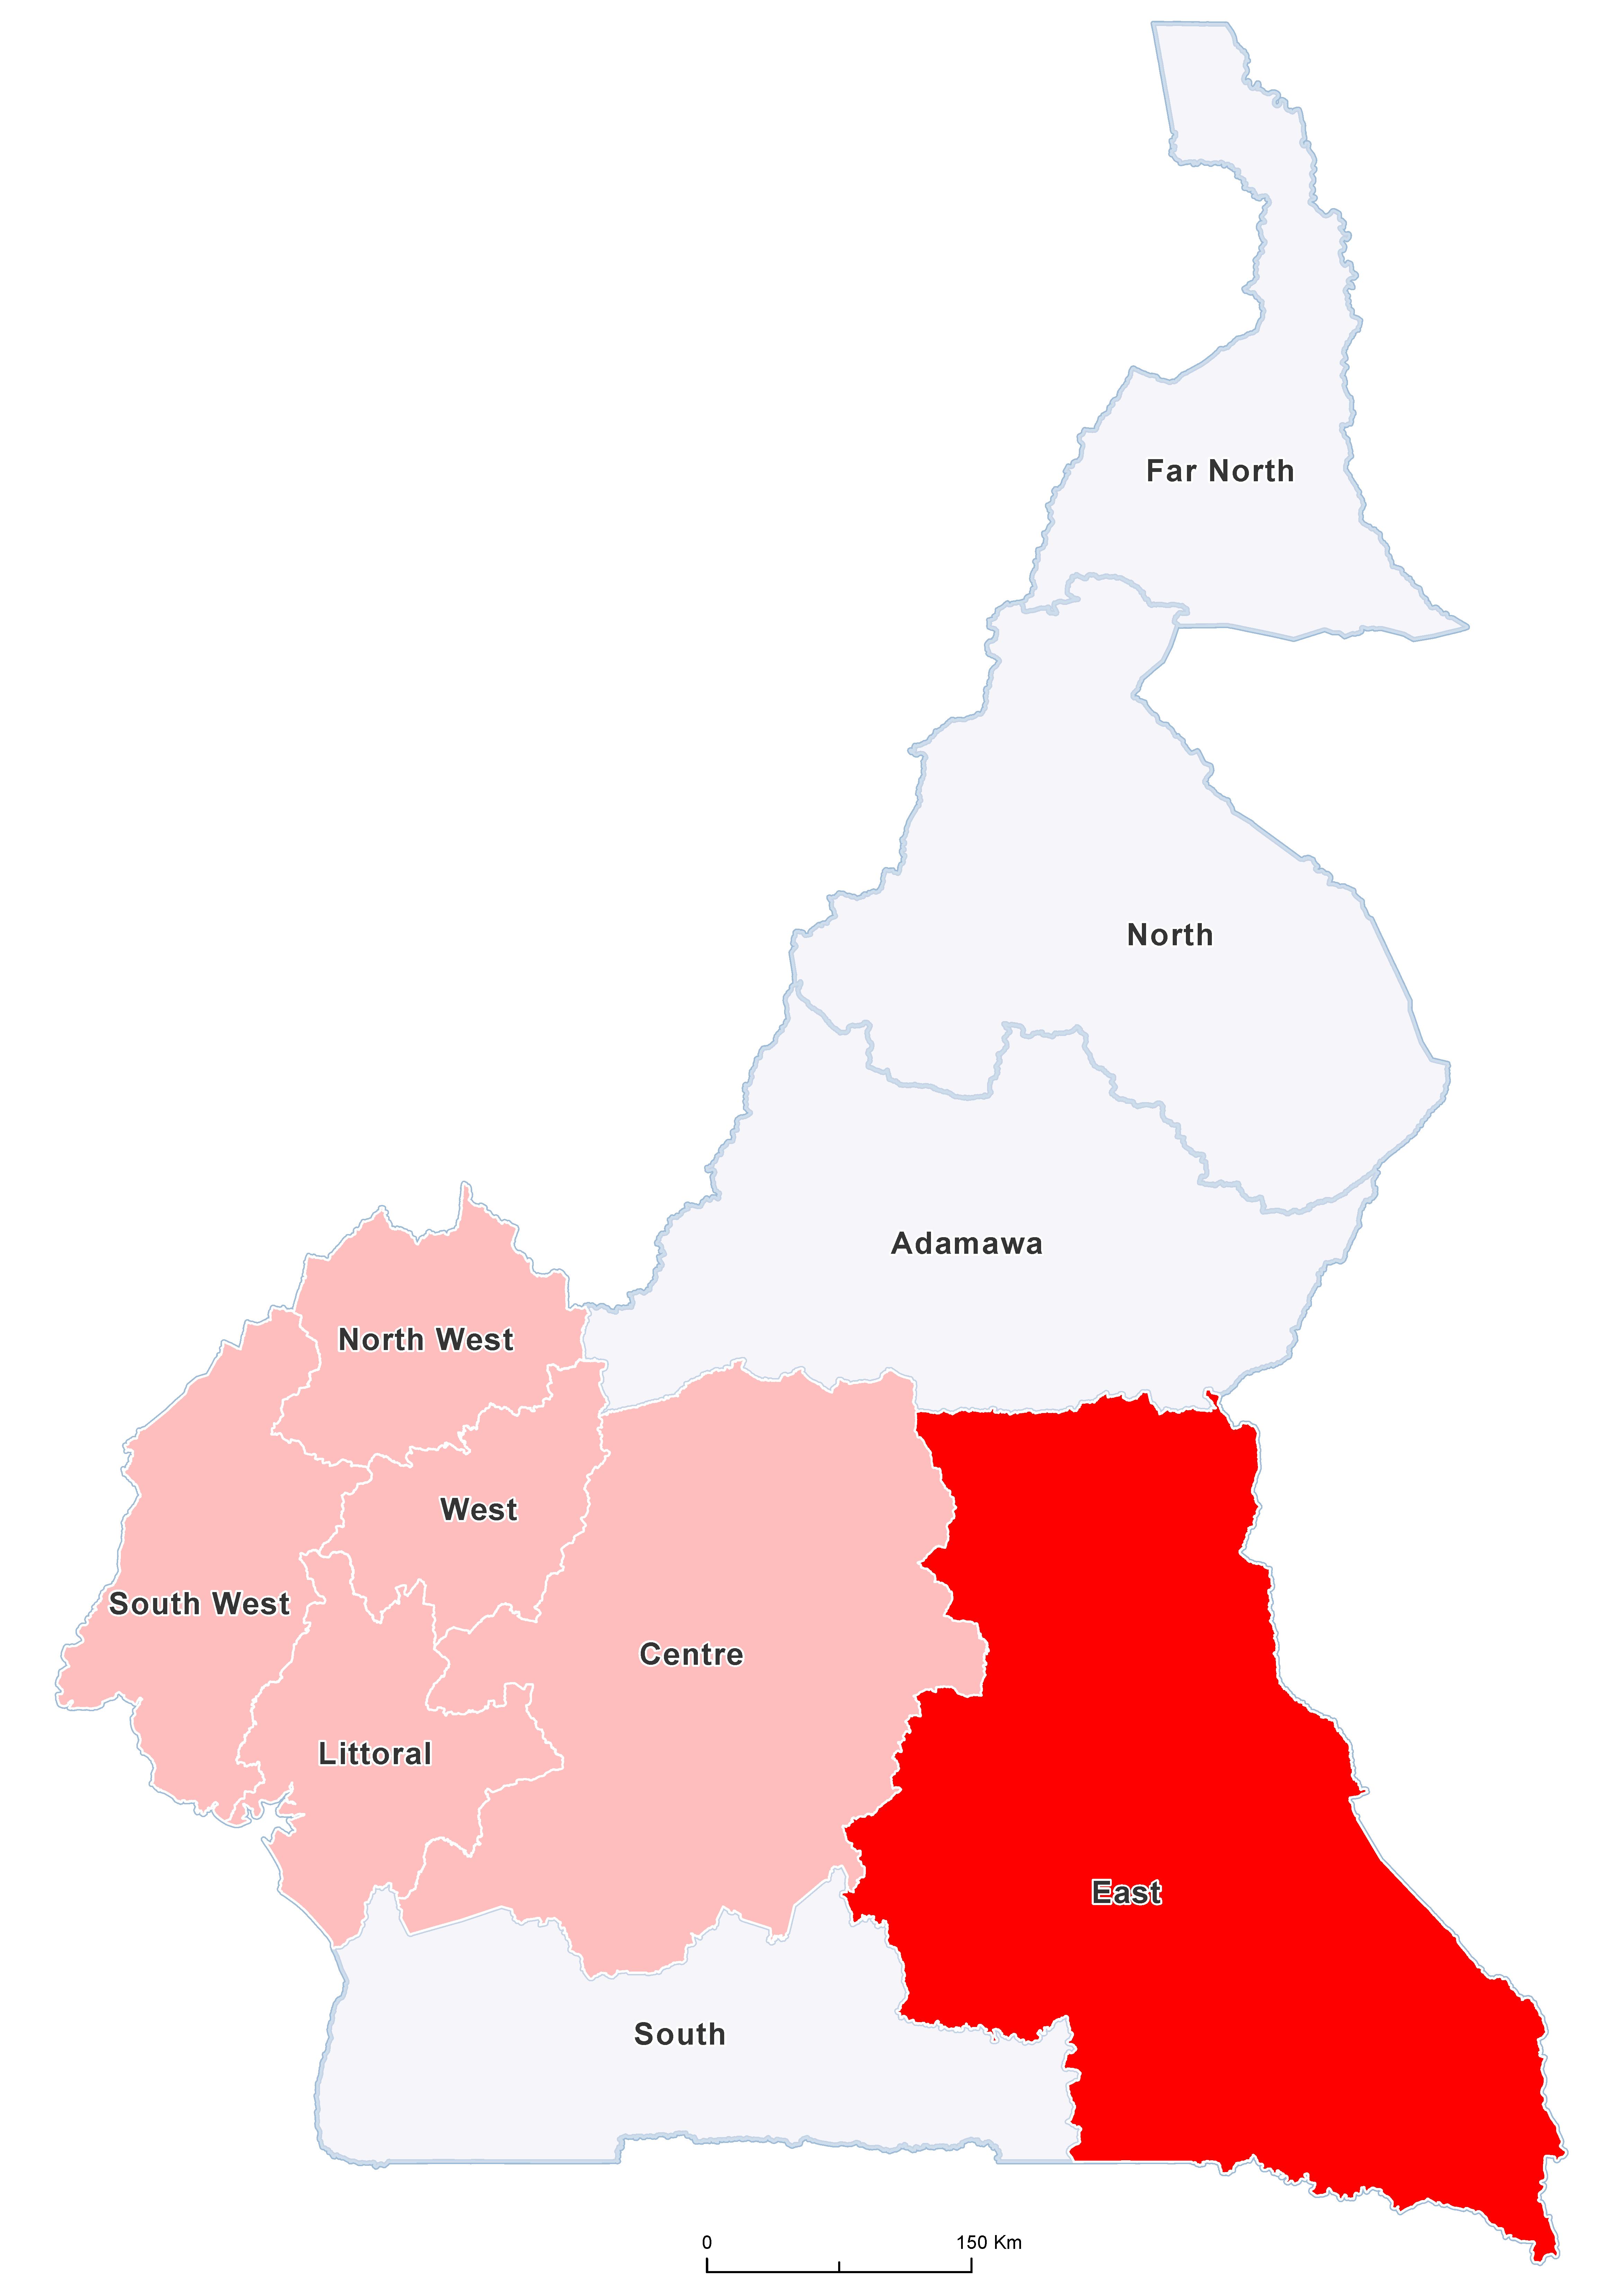 STH-Mean Prevalence 20180001